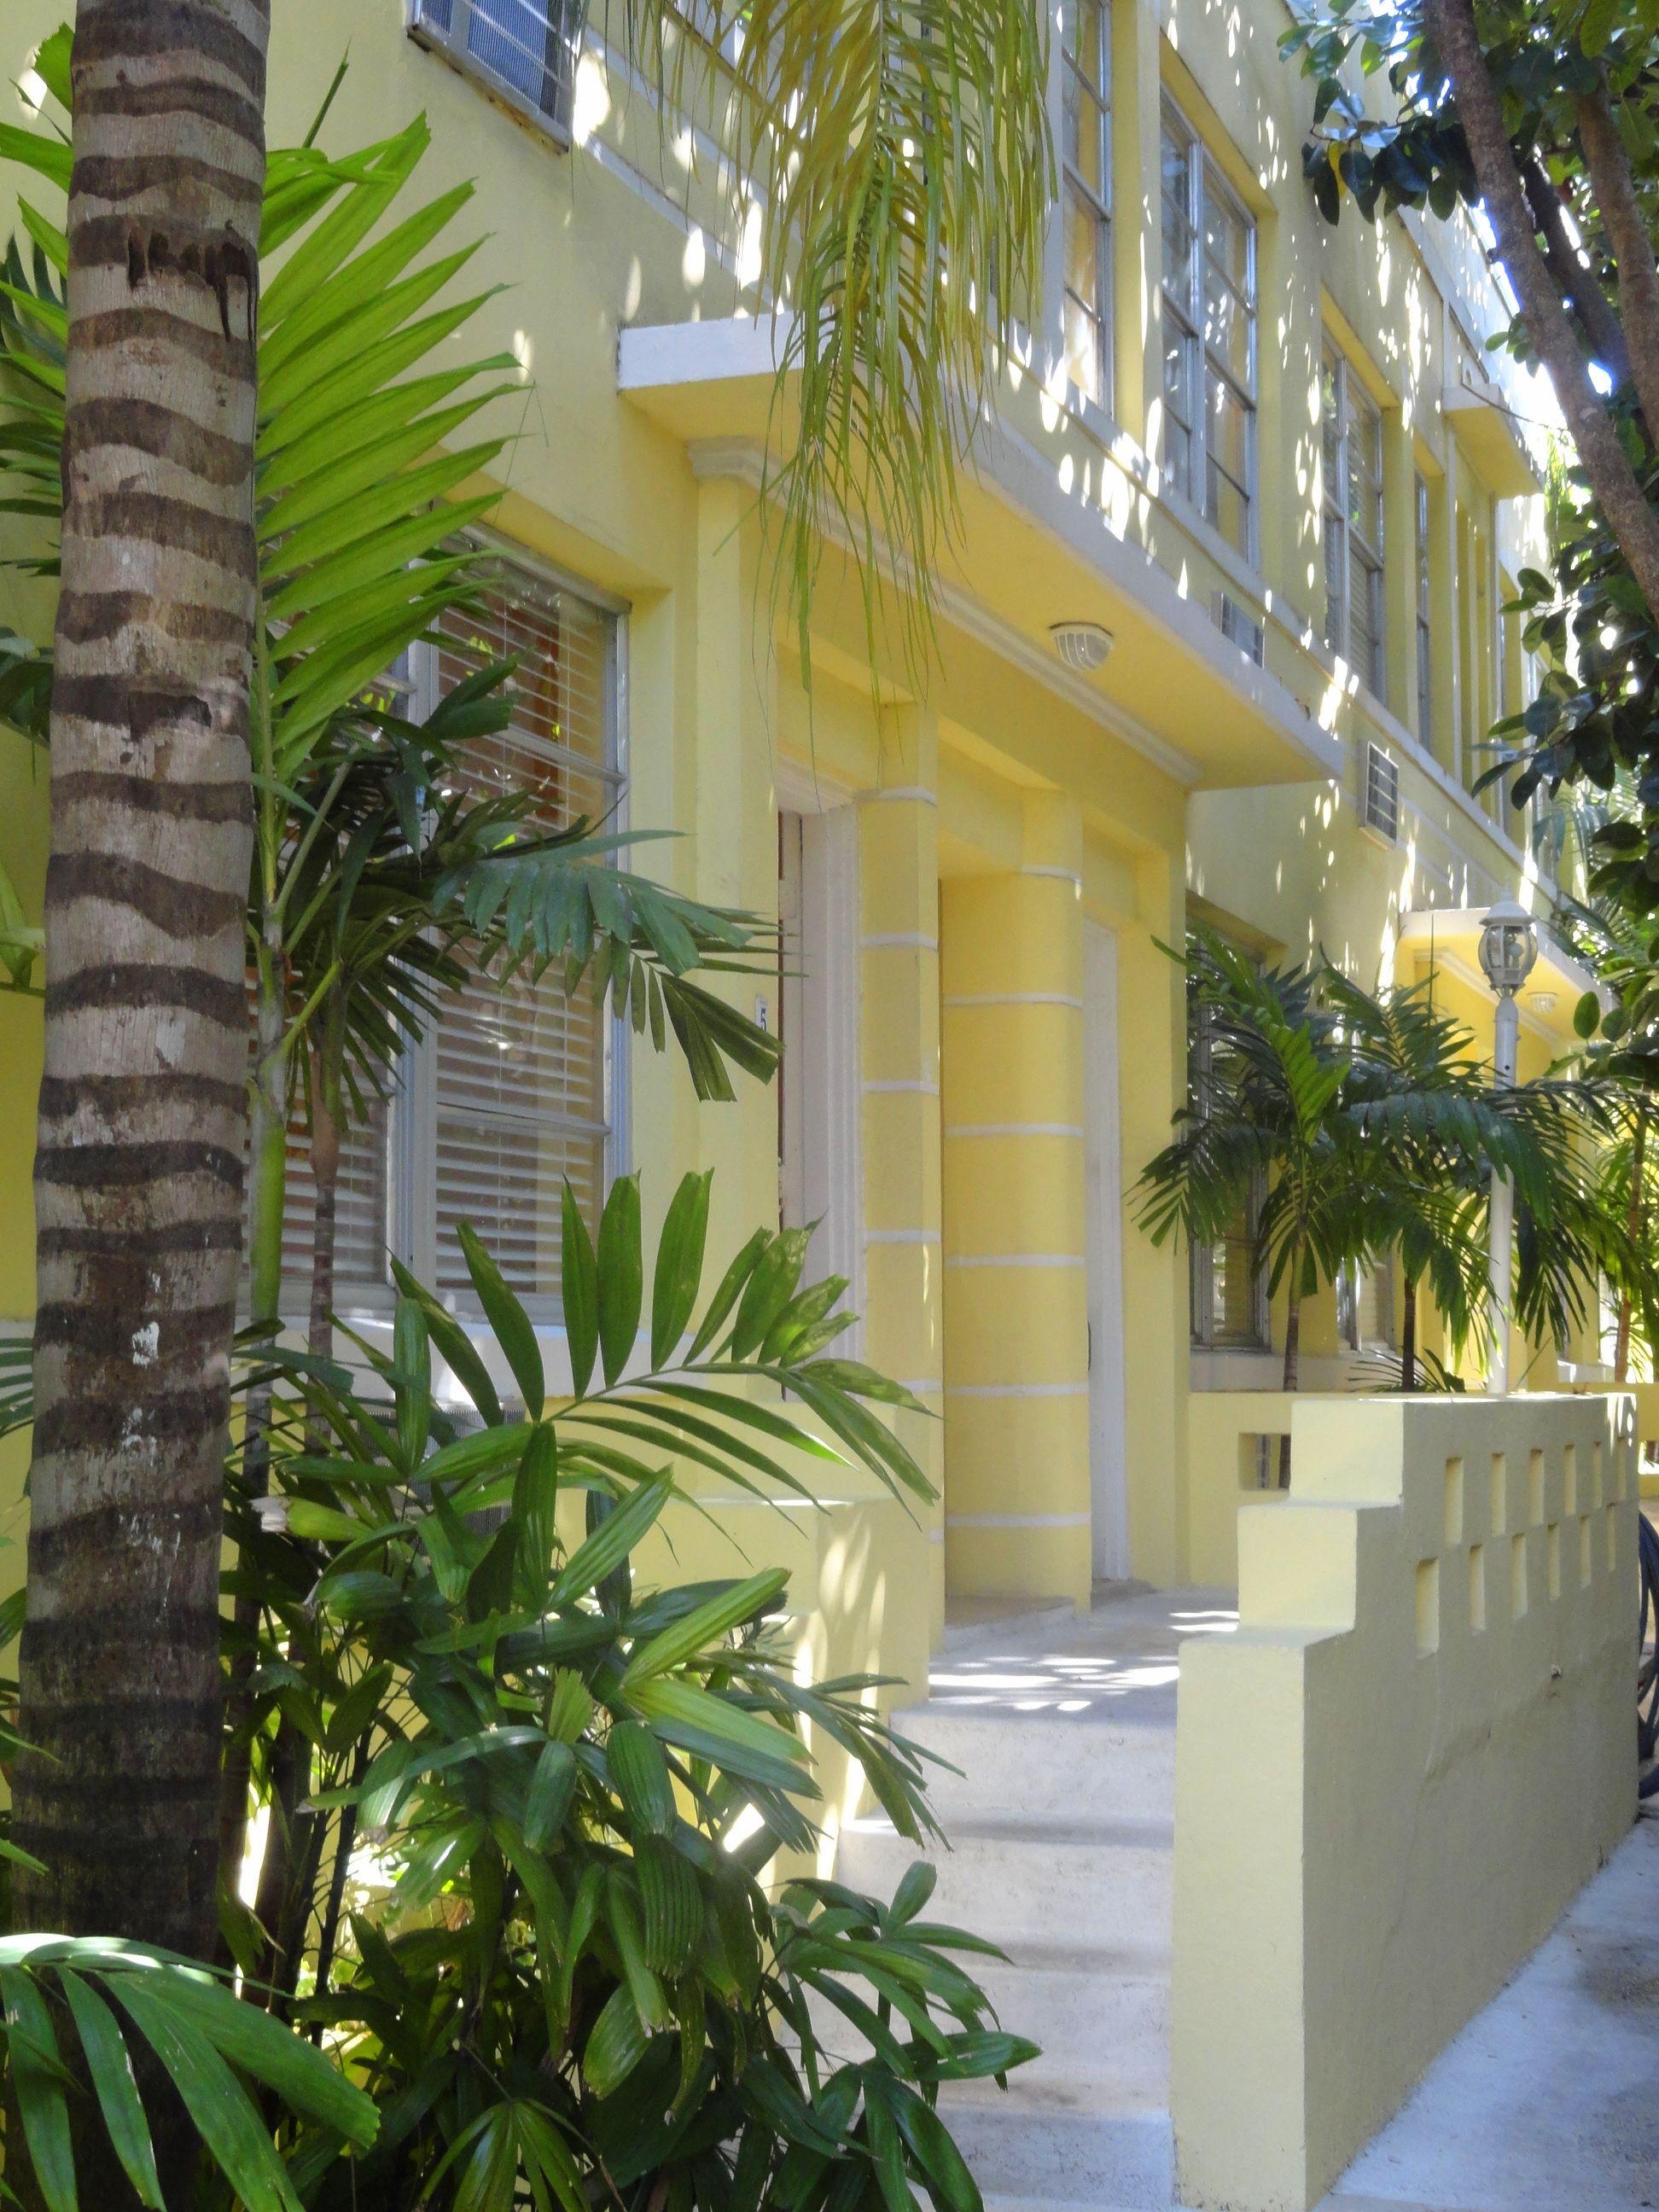 Villa Paradiso South Beach Miami By Lucie